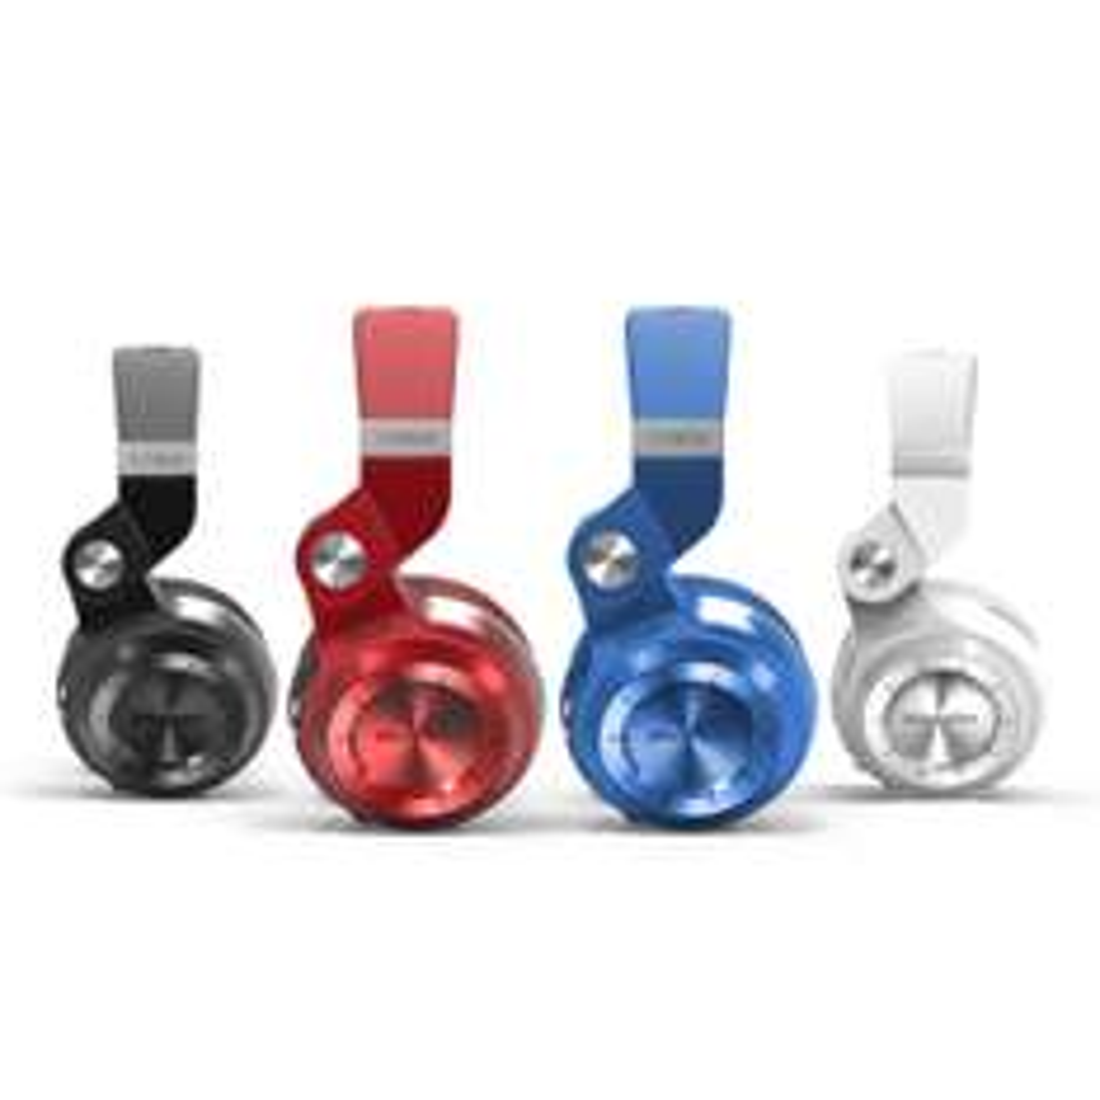 Bluedio T2+ (Turbine 2 Plus) Bluetooth On-Ear Kopfhörer mit Mikrofon, Micro SD (TF) ab 27,49€